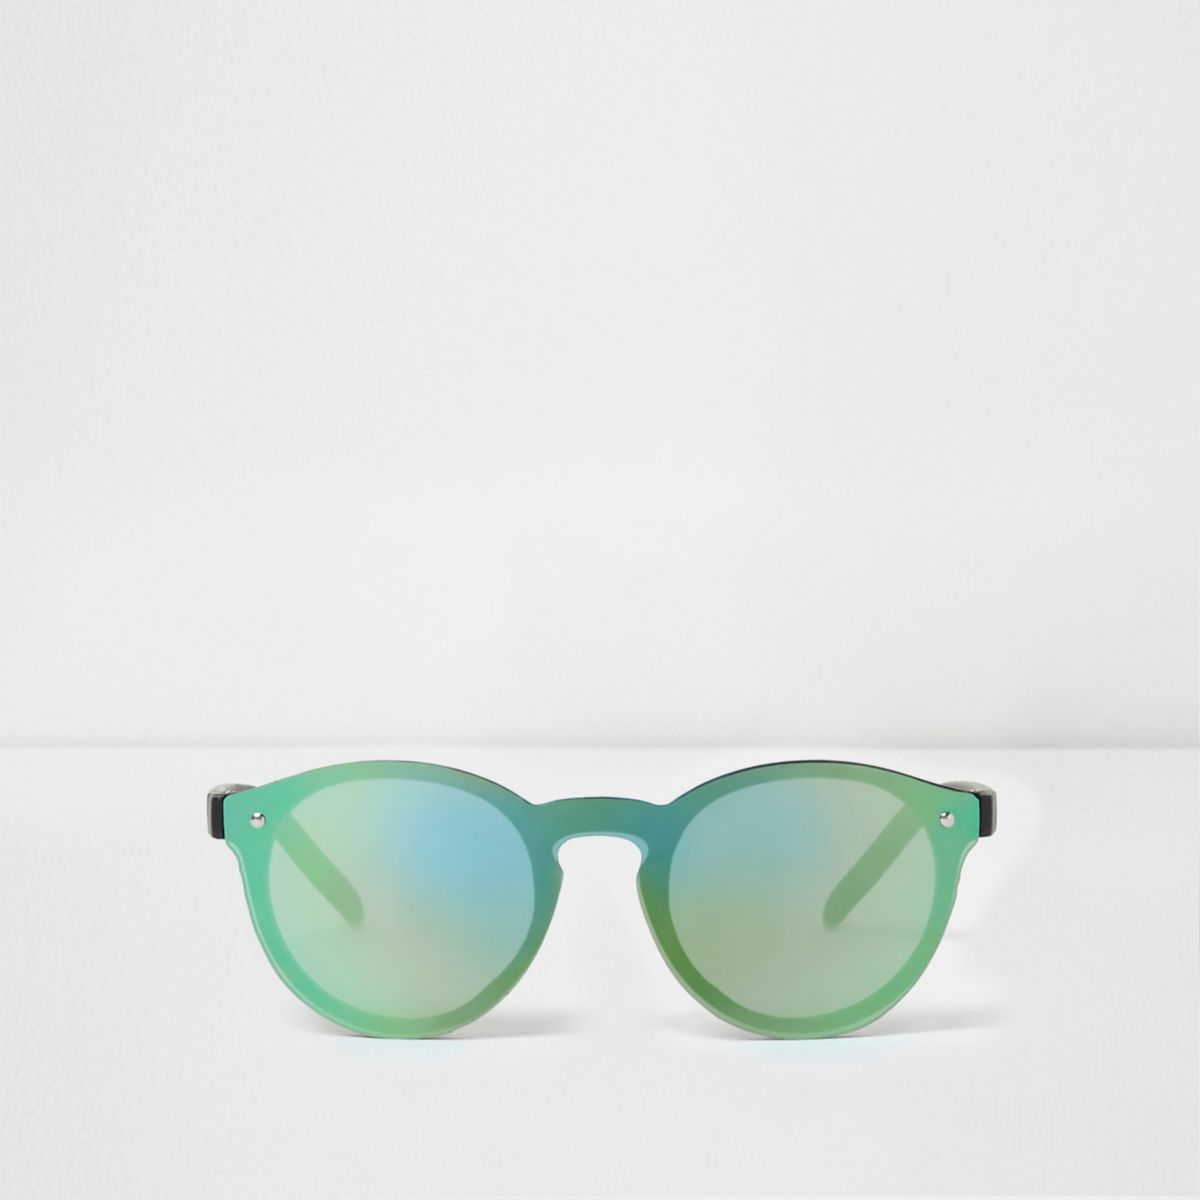 Boys green laid on lens retro sunglasses